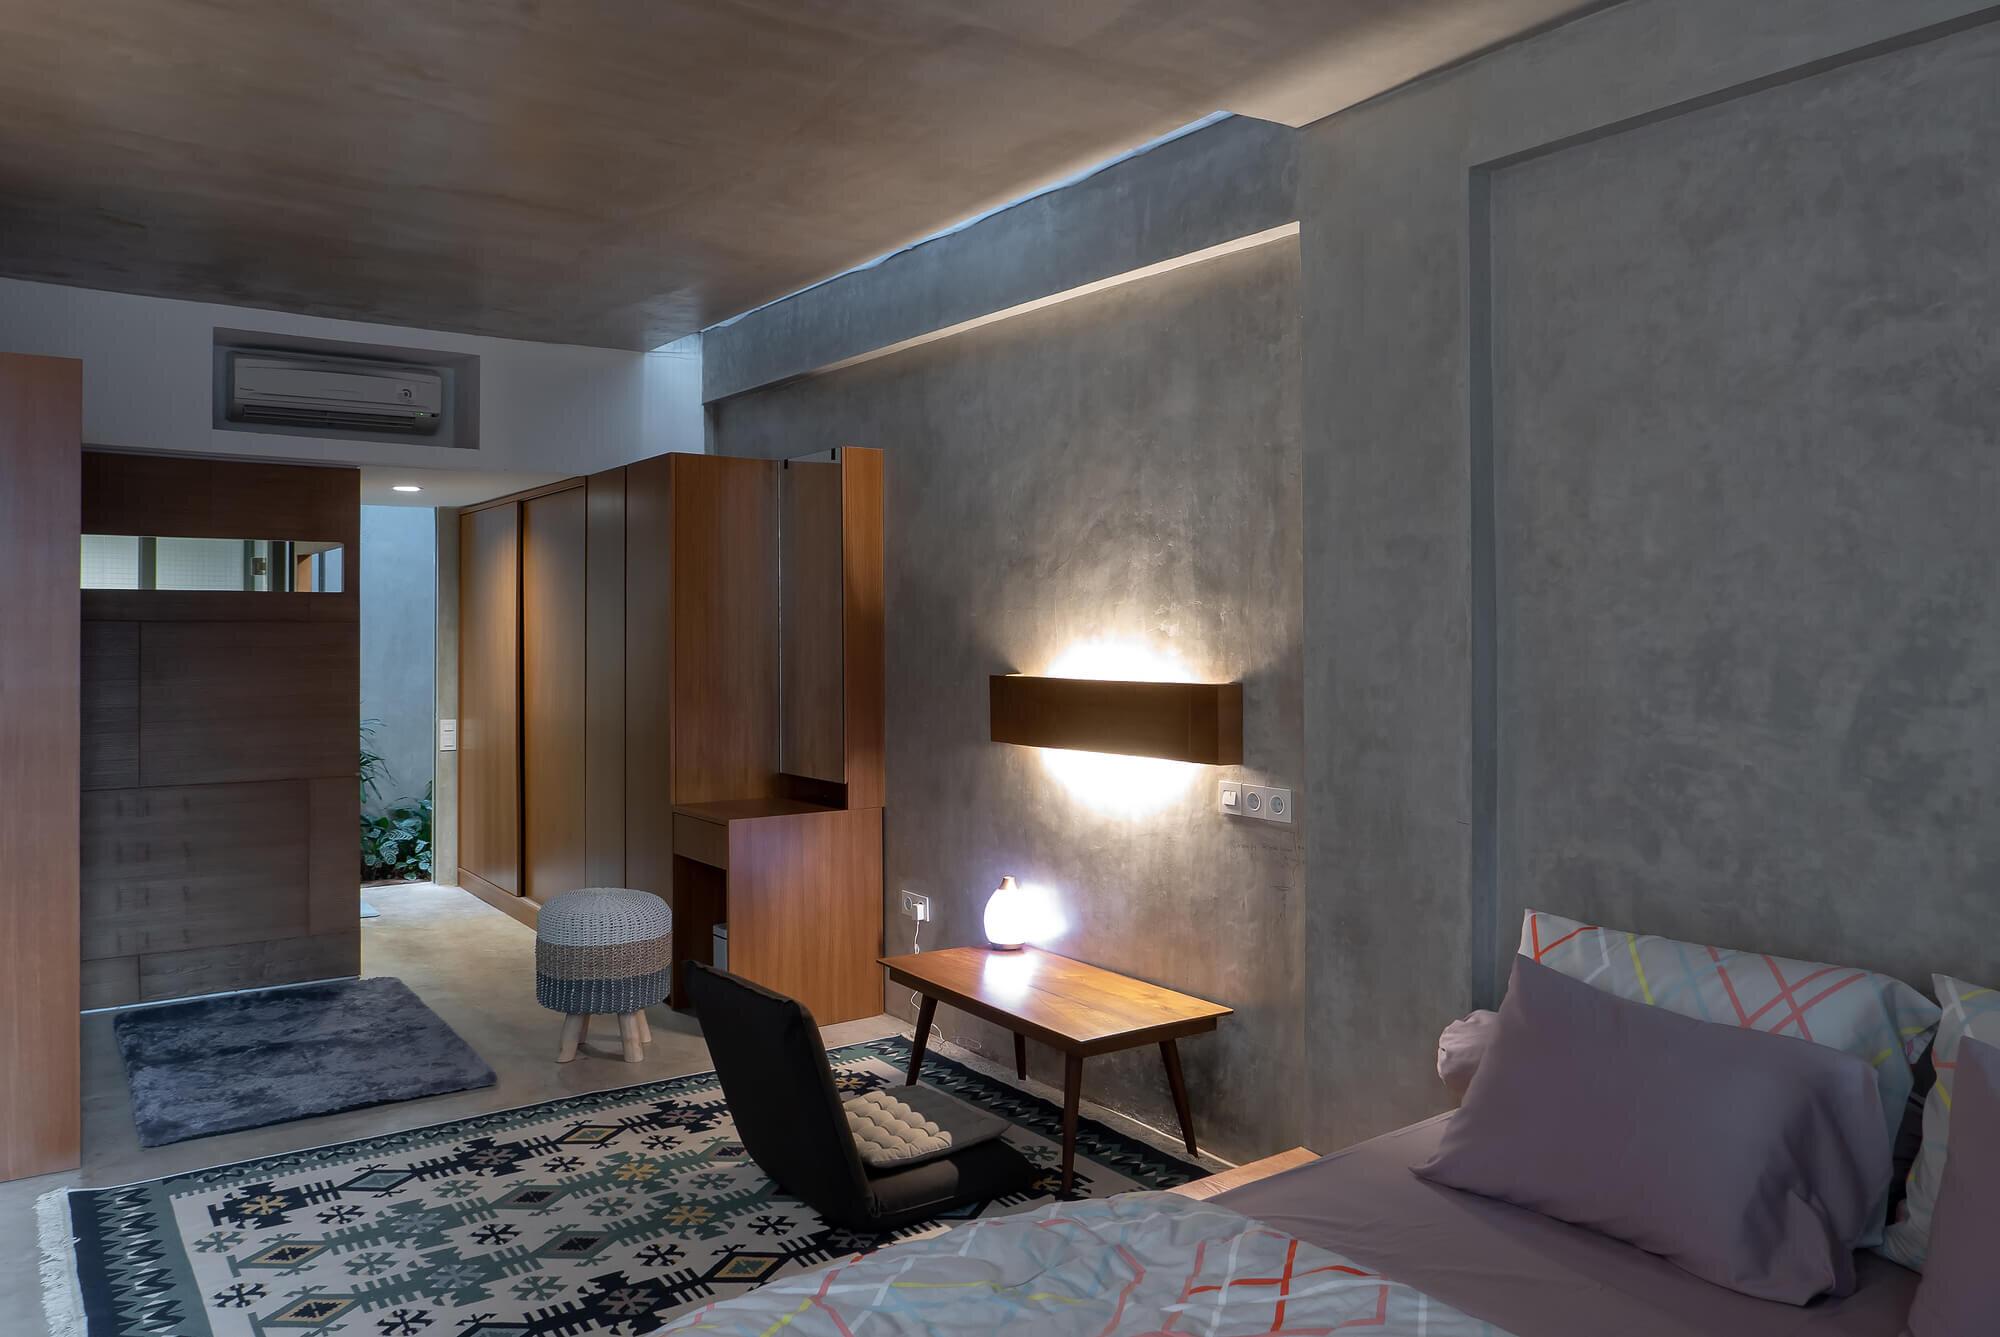 3500-Millimetre-House-Ago-Architects-Indonesia-16